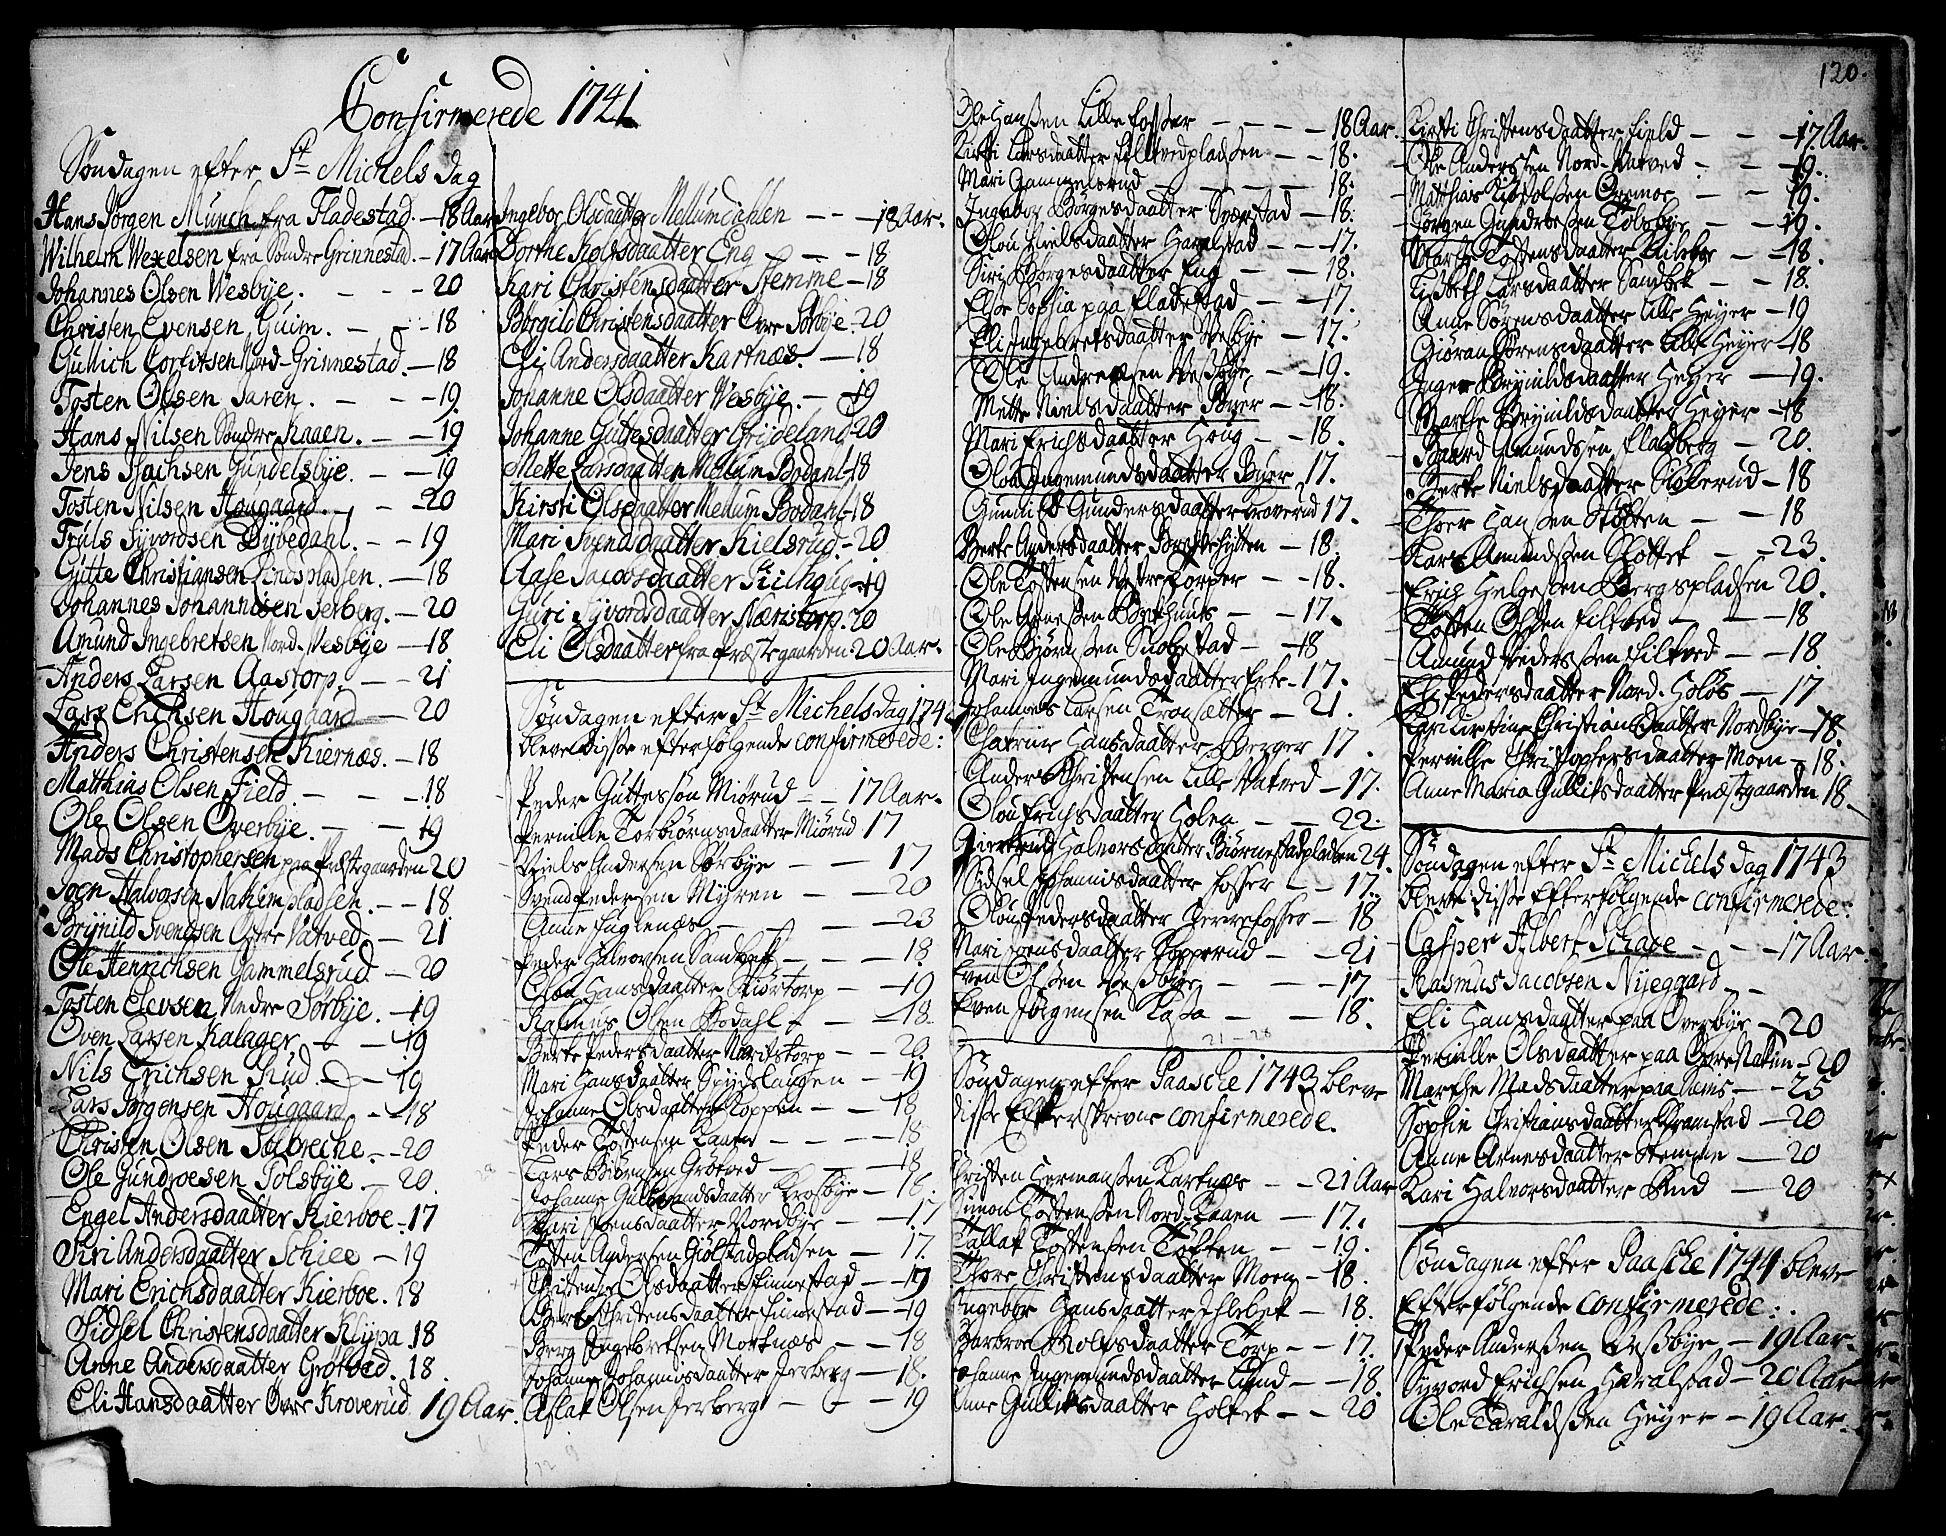 SAO, Rakkestad prestekontor Kirkebøker, F/Fa/L0002: Ministerialbok nr. I 2, 1741-1751, s. 120